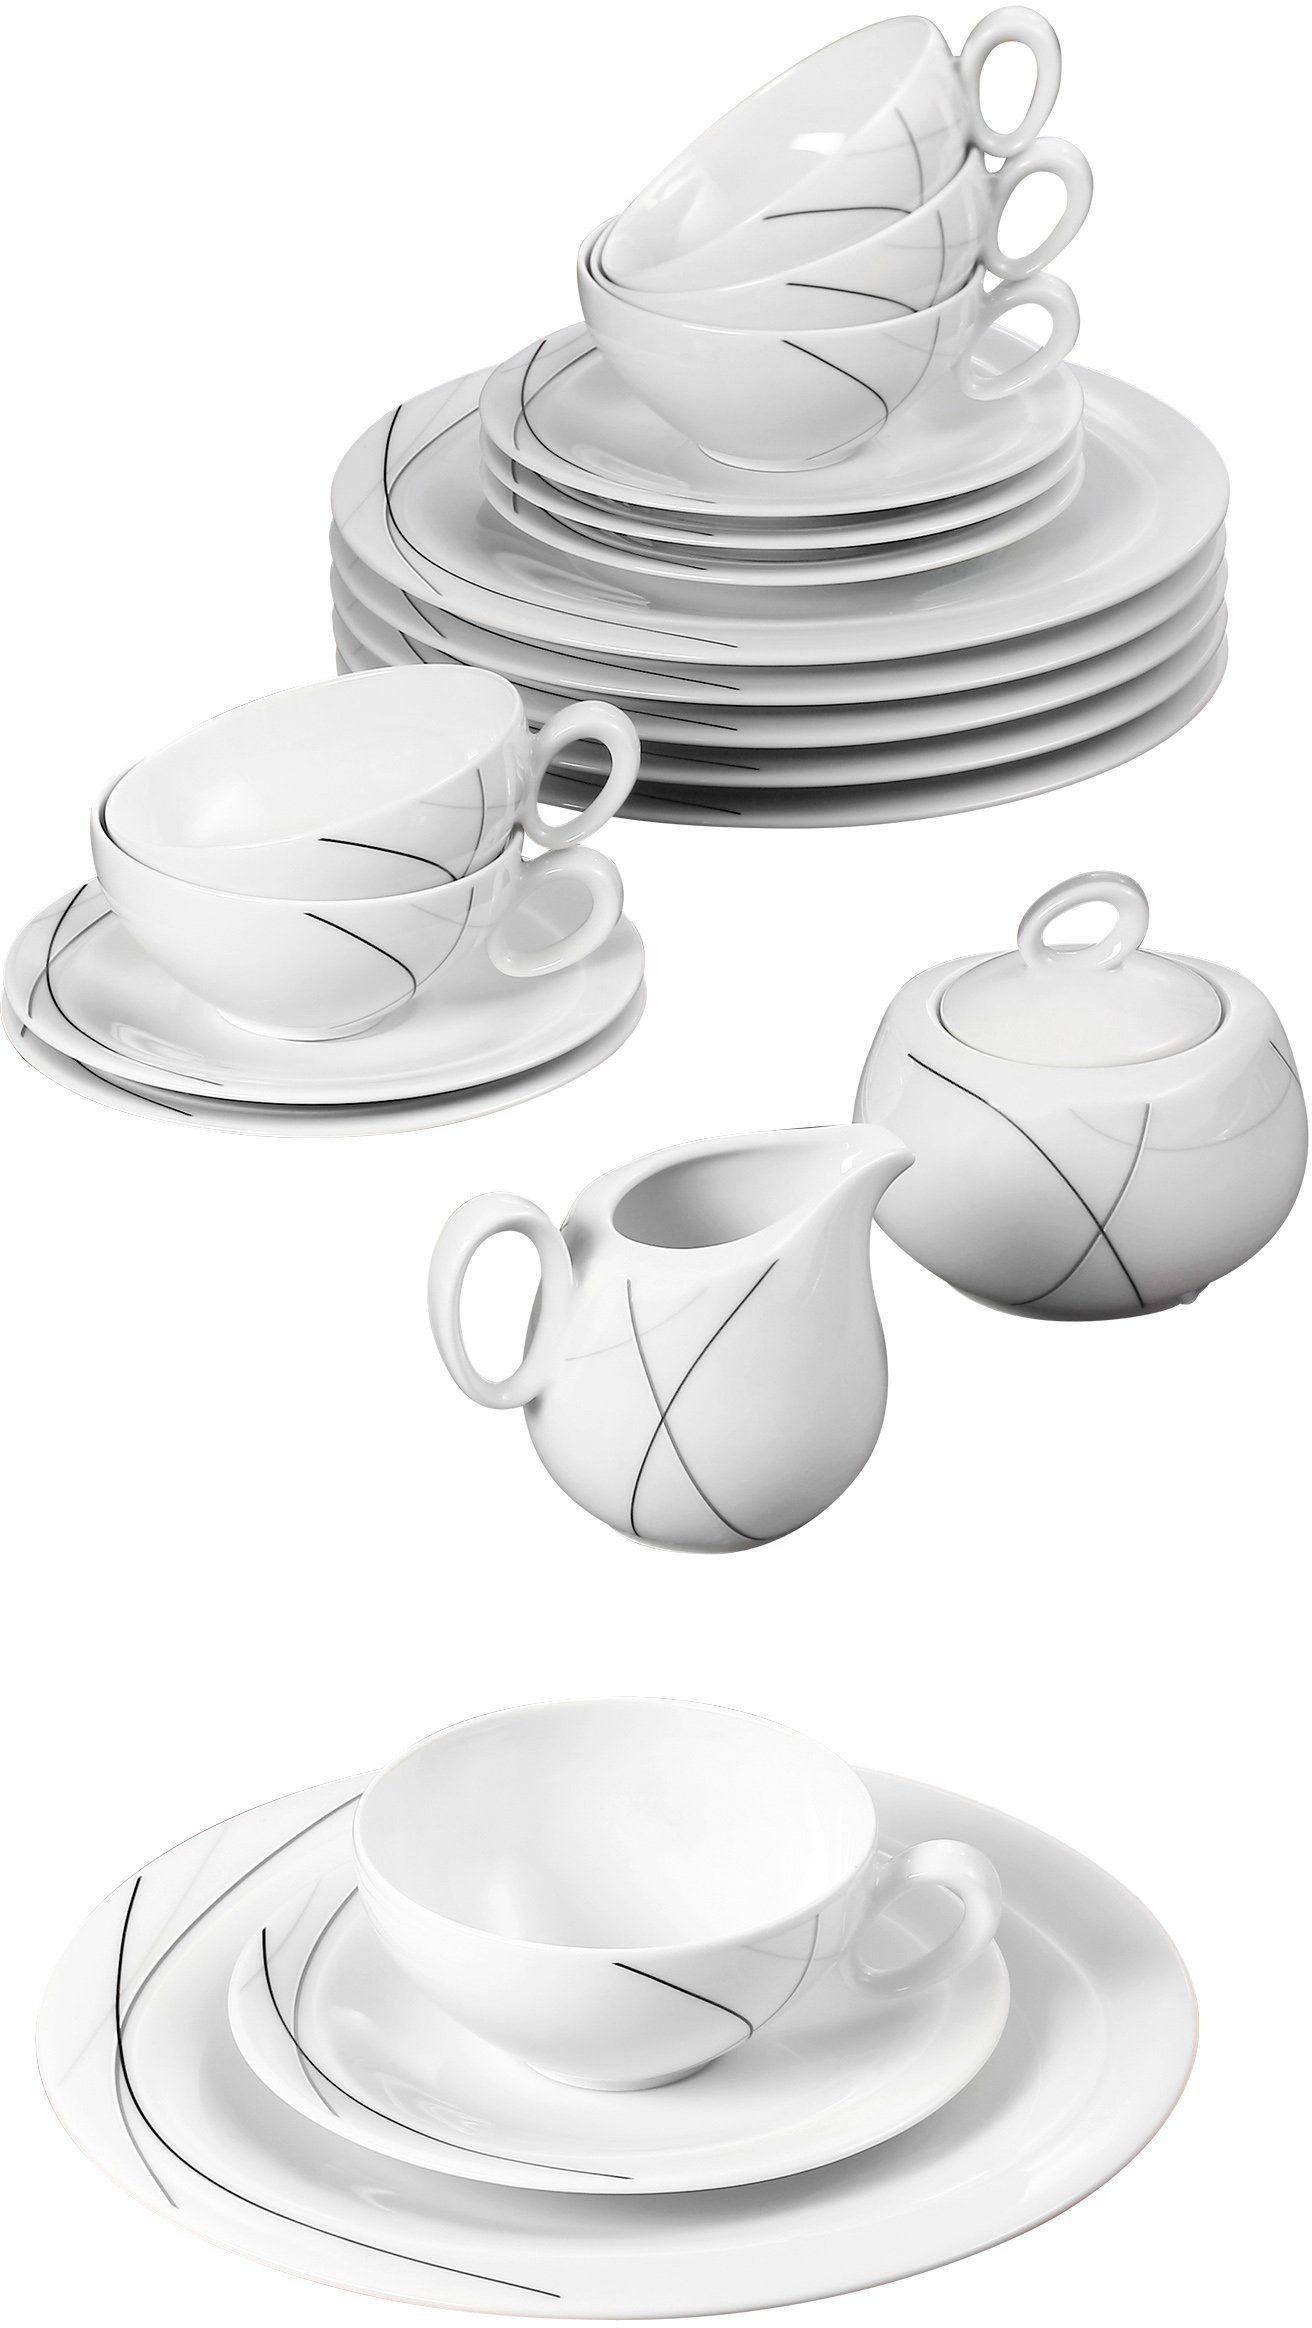 Seltmann Weiden Teeservice, Porzellan, 20-teilig, »TRIO HIGHLINE«